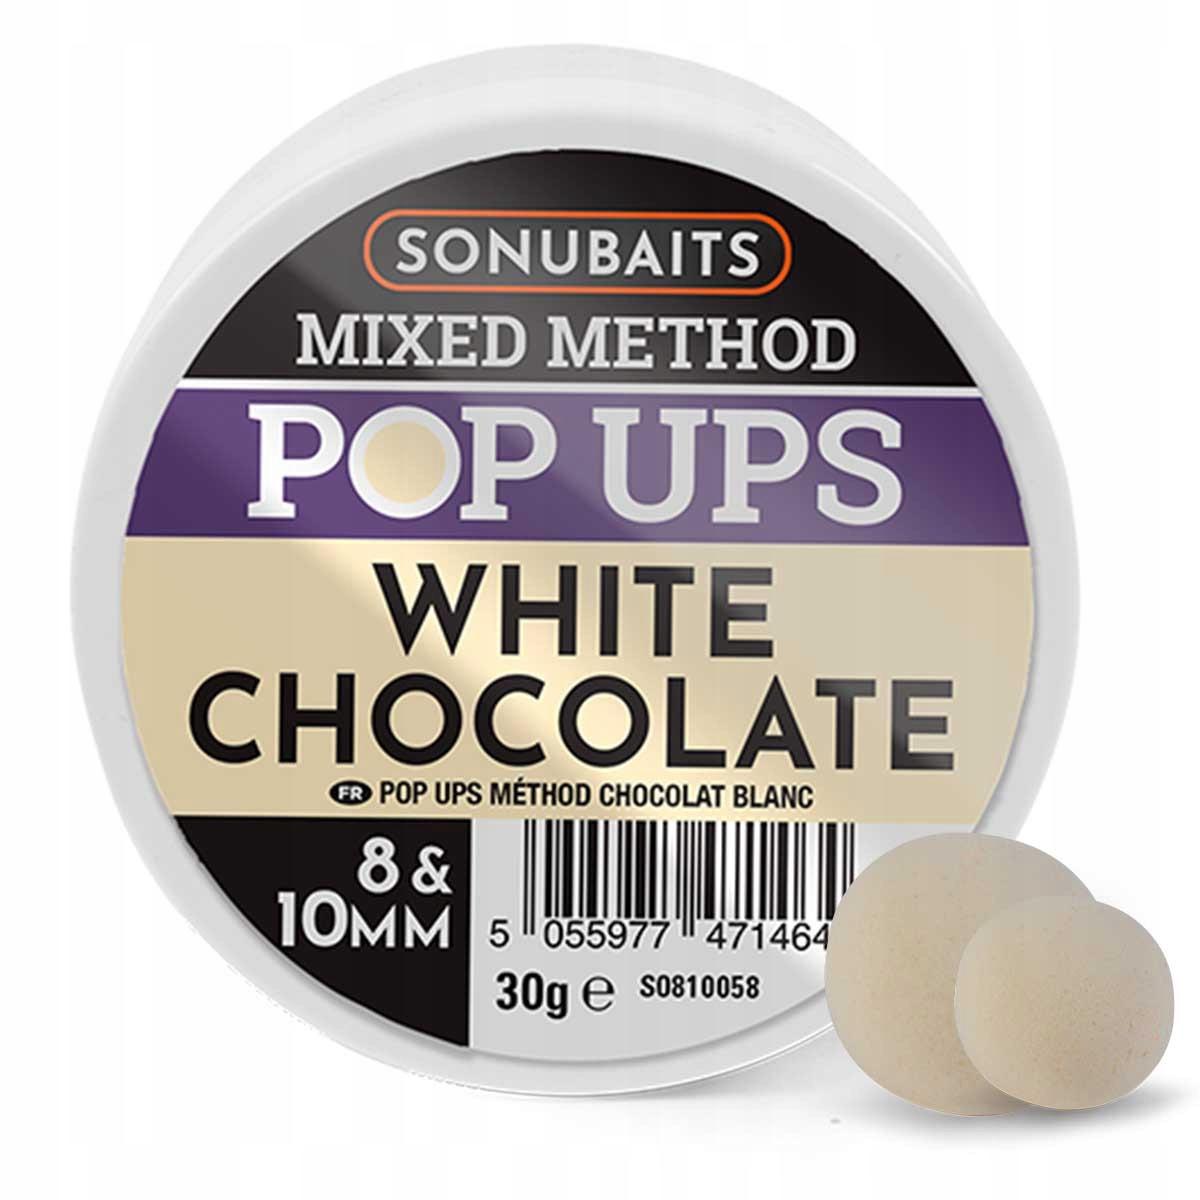 Sonubaits Mixed Method Pop Ups W Chocolate 8/10 MM